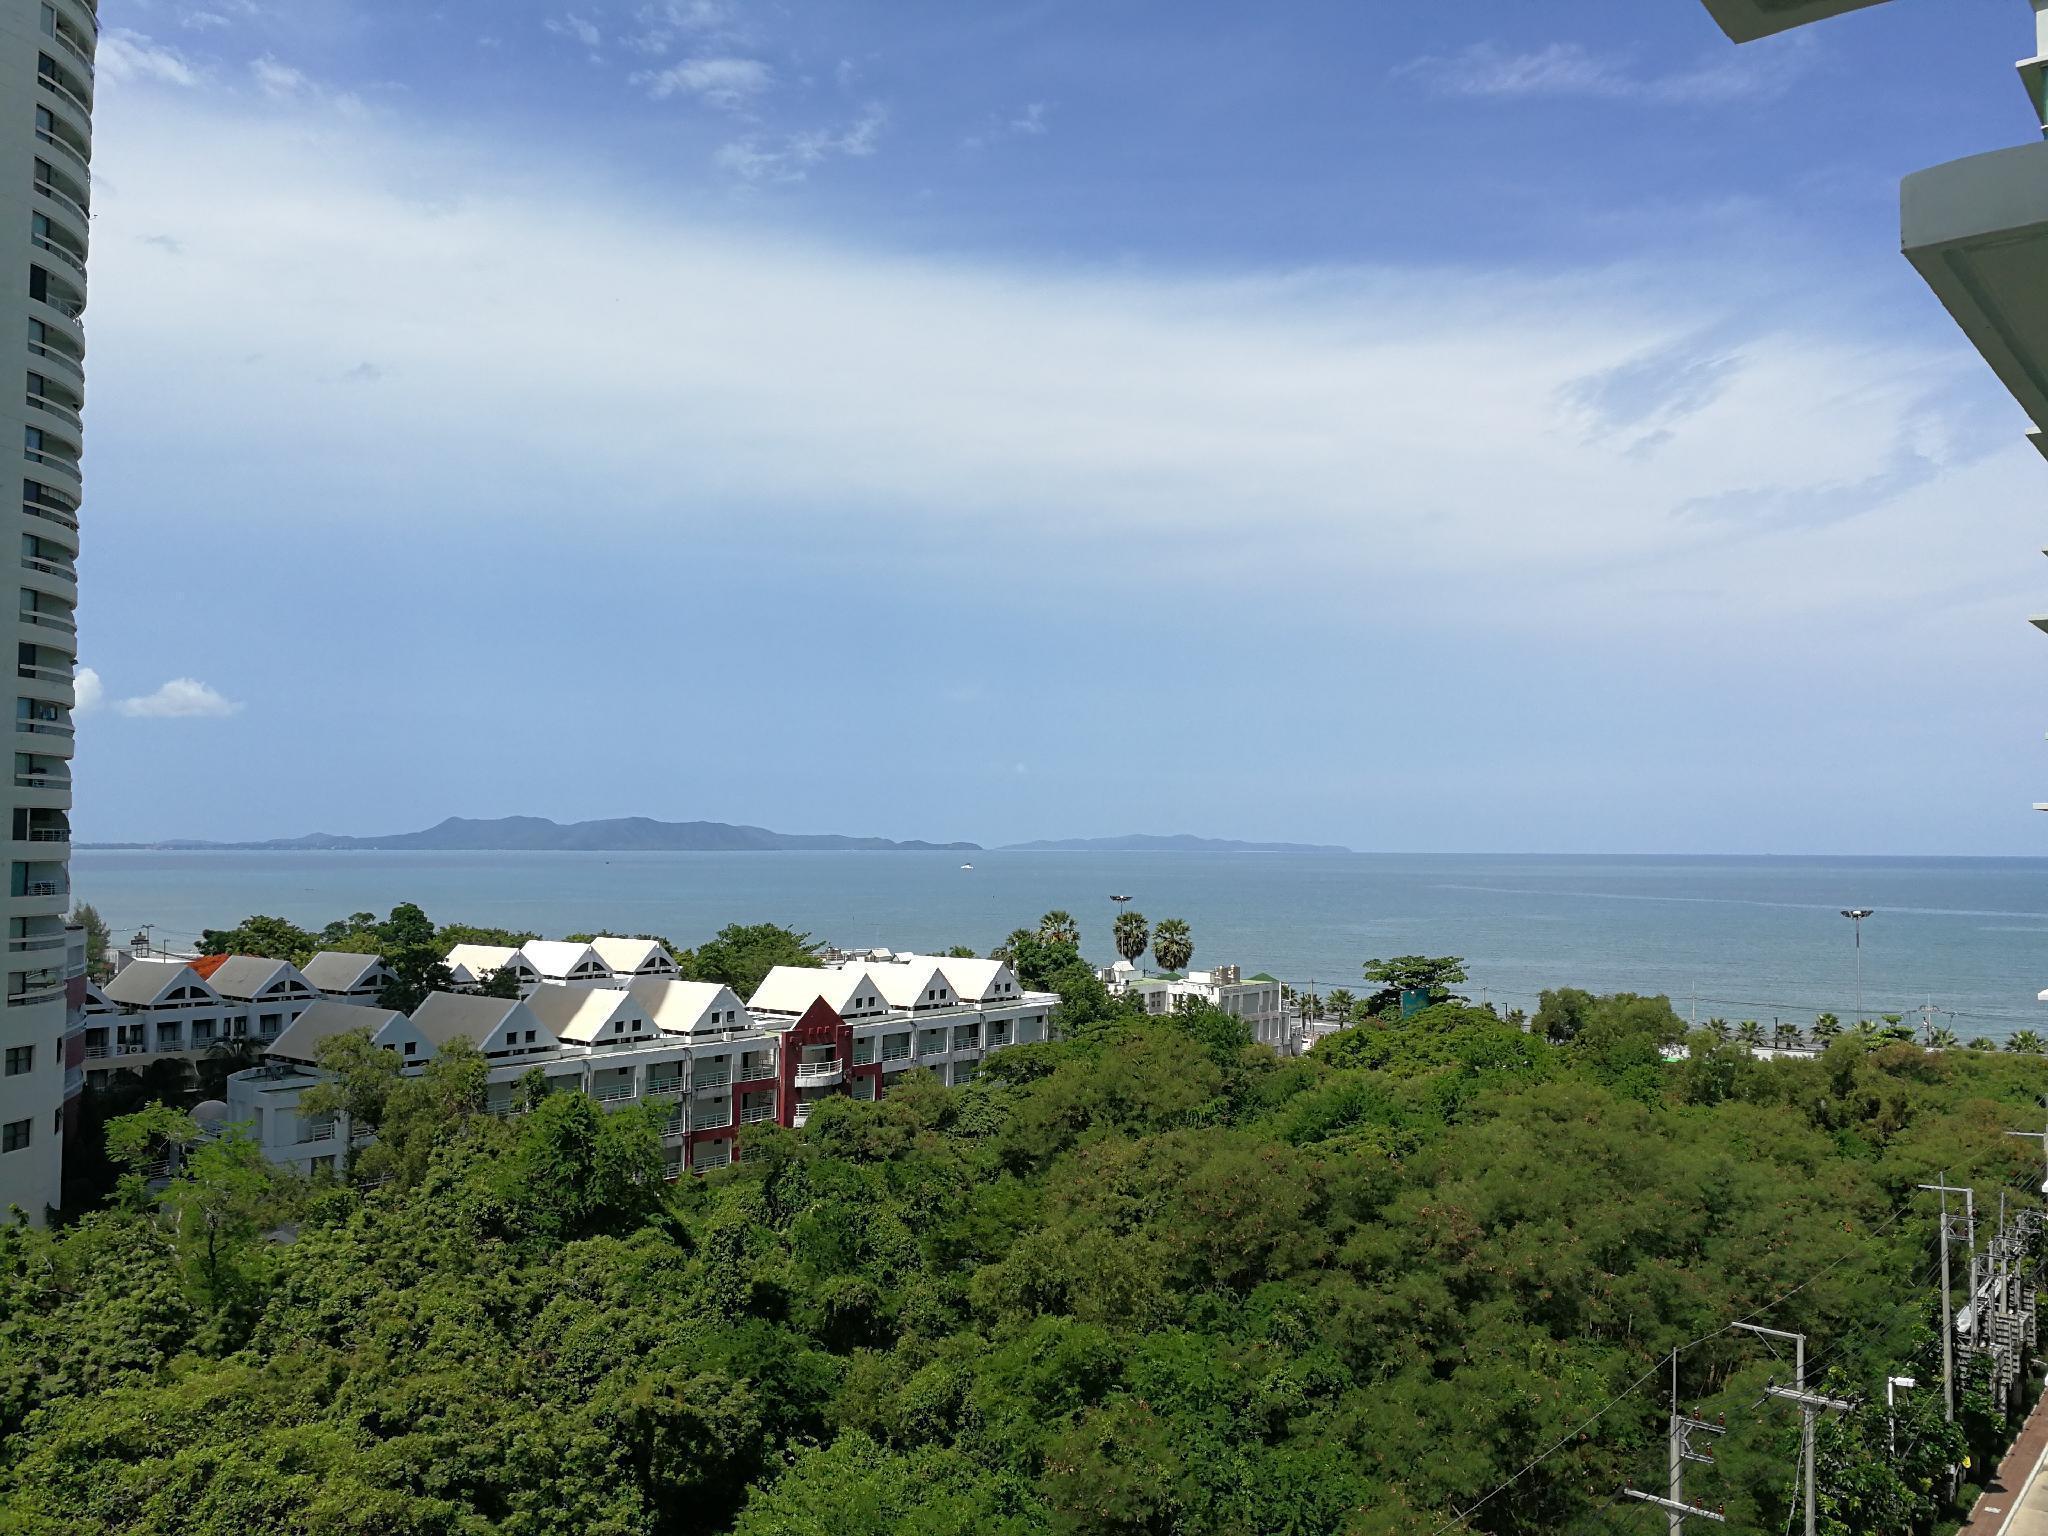 Sea view apartment (lumpini park beach jomtien) อพาร์ตเมนต์ 1 ห้องนอน 1 ห้องน้ำส่วนตัว ขนาด 32 ตร.ม. – หาดจอมเทียน